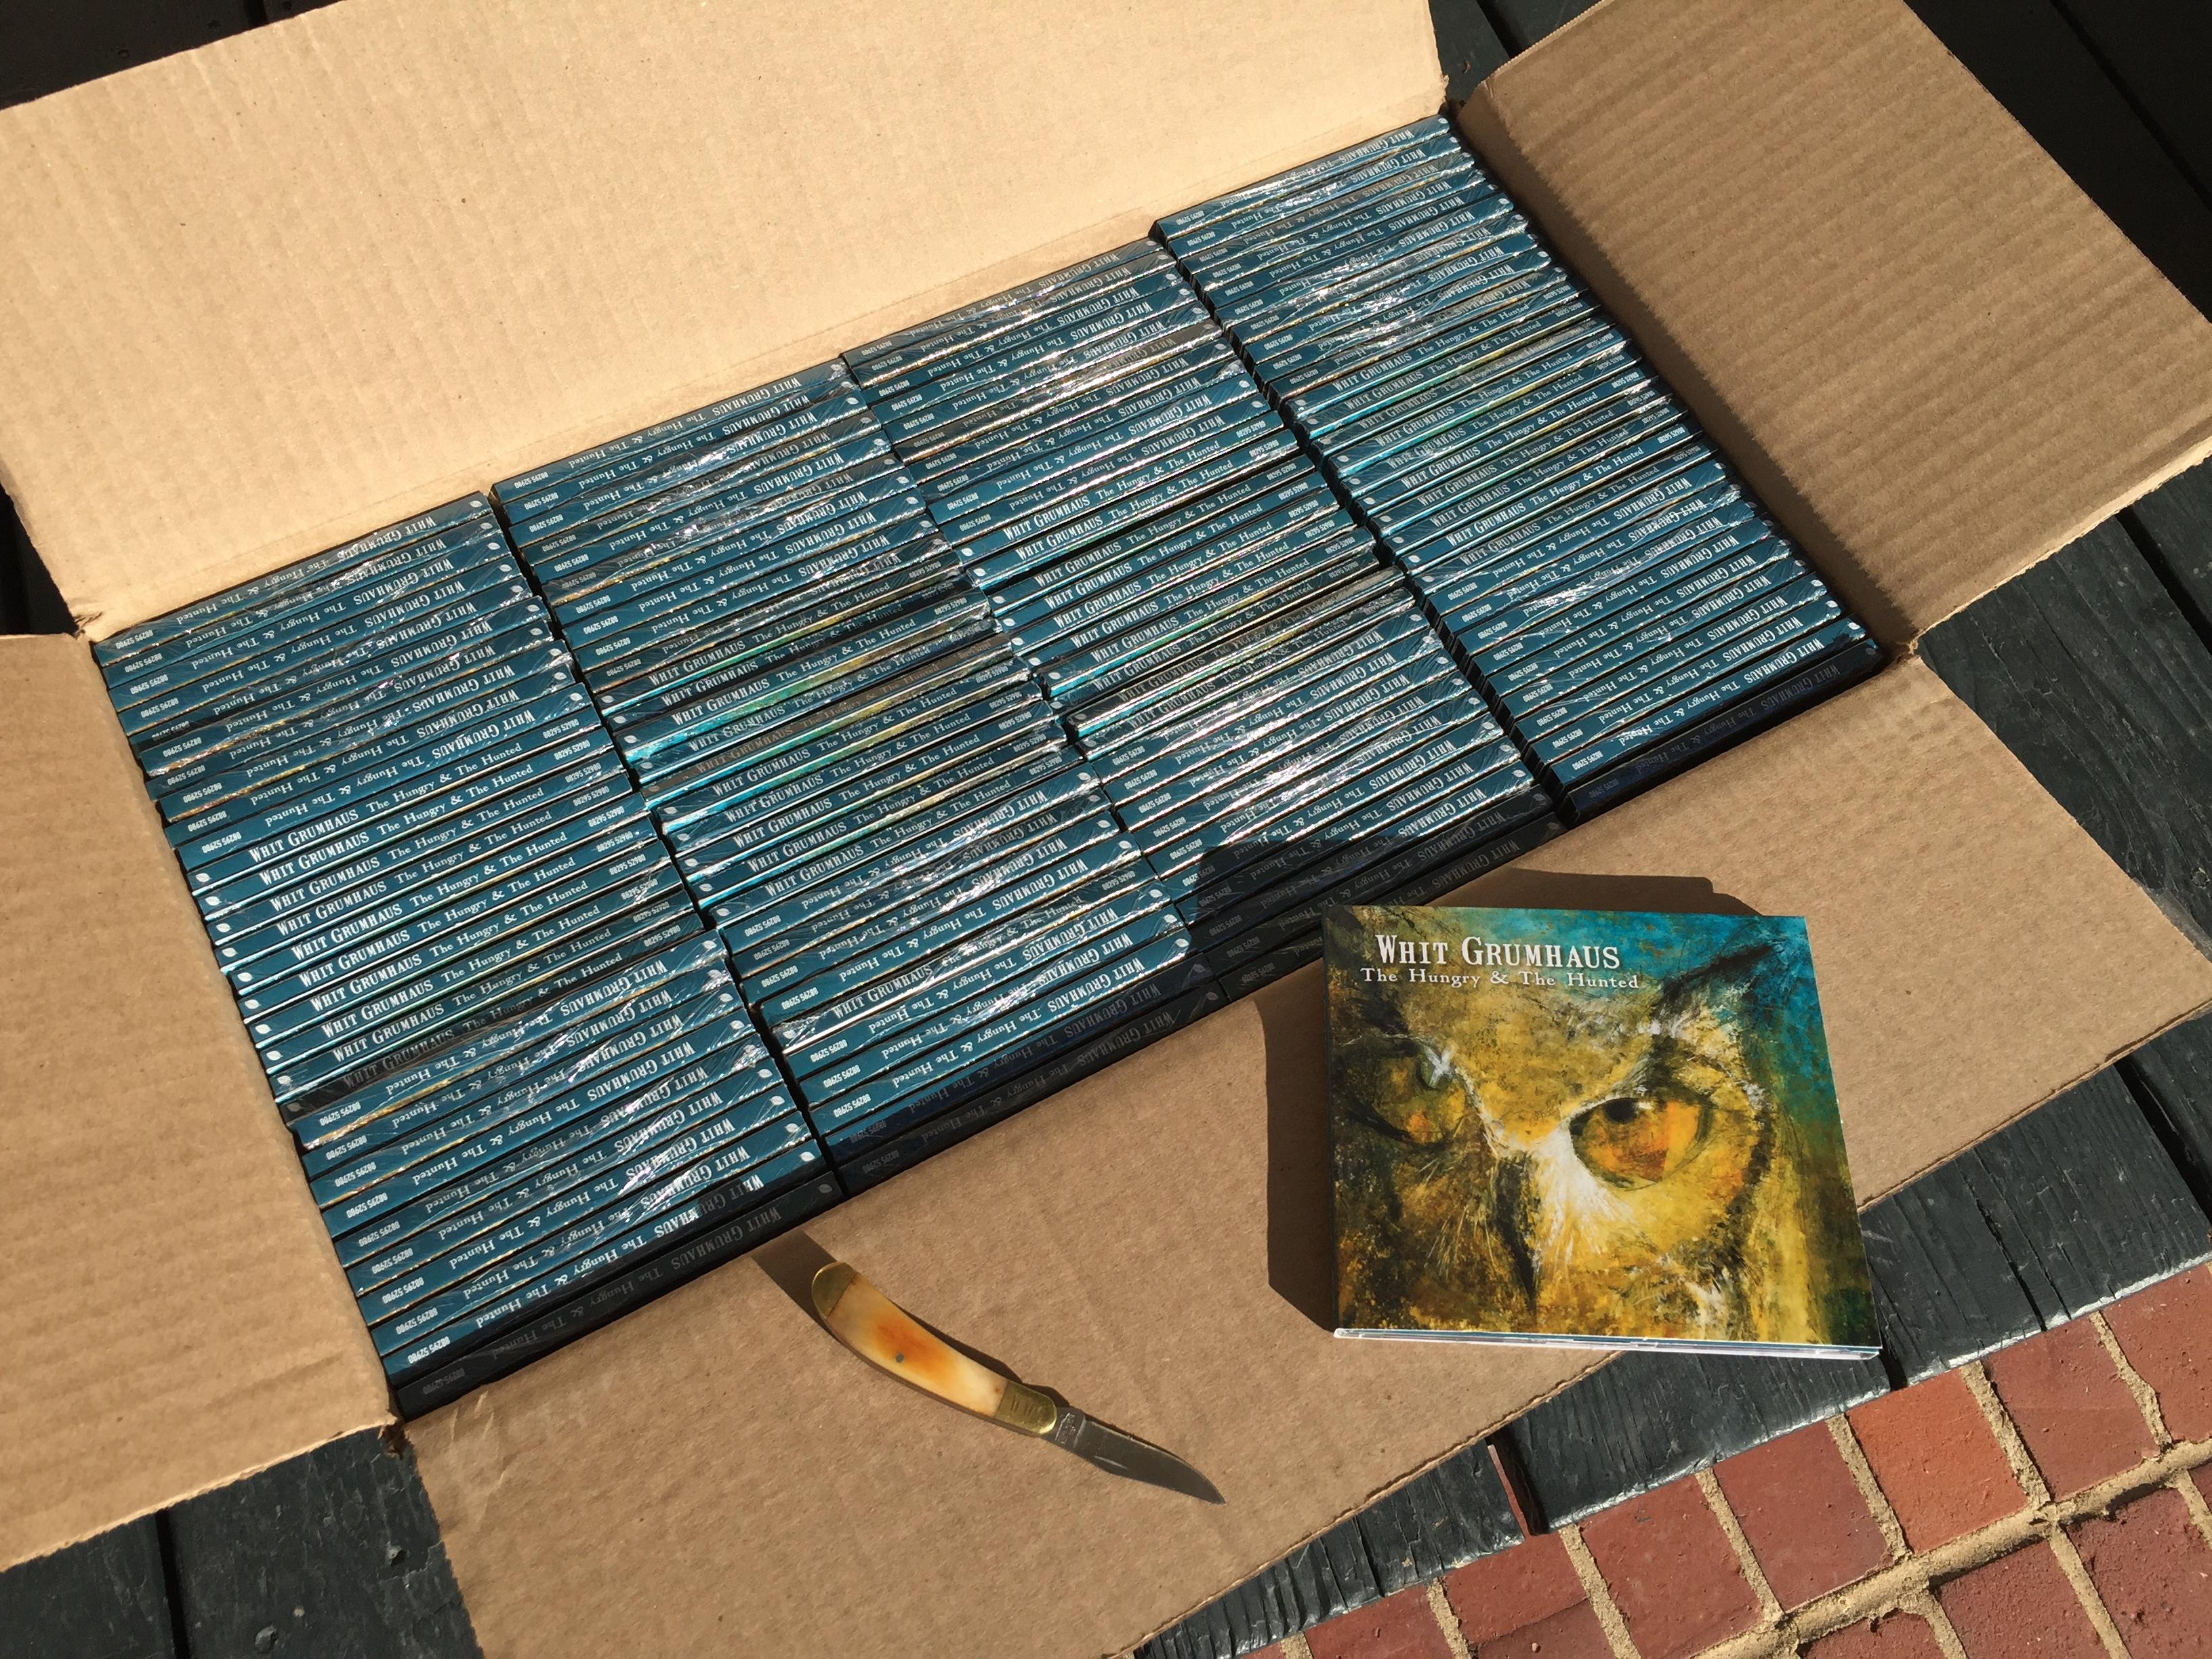 CD box opening